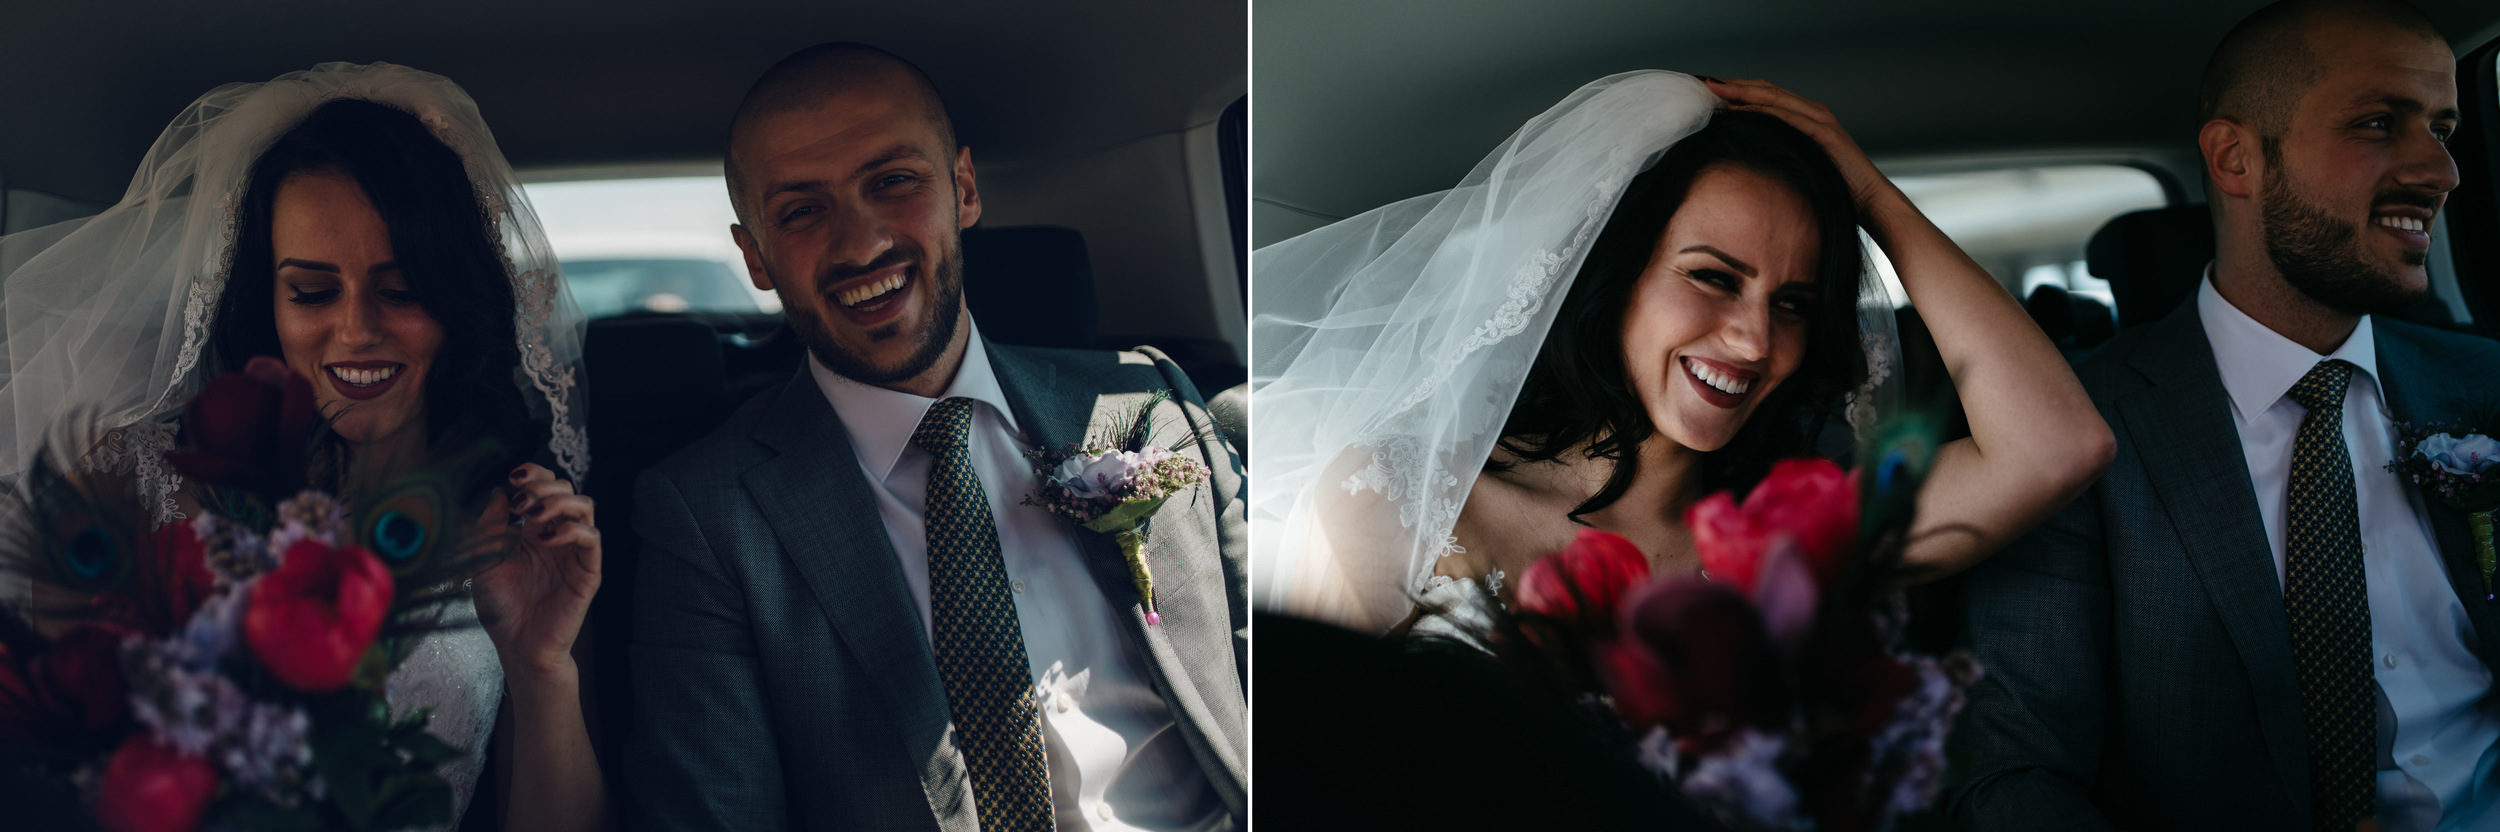 bruidsfotografie amsterdam bruidspaar in auto